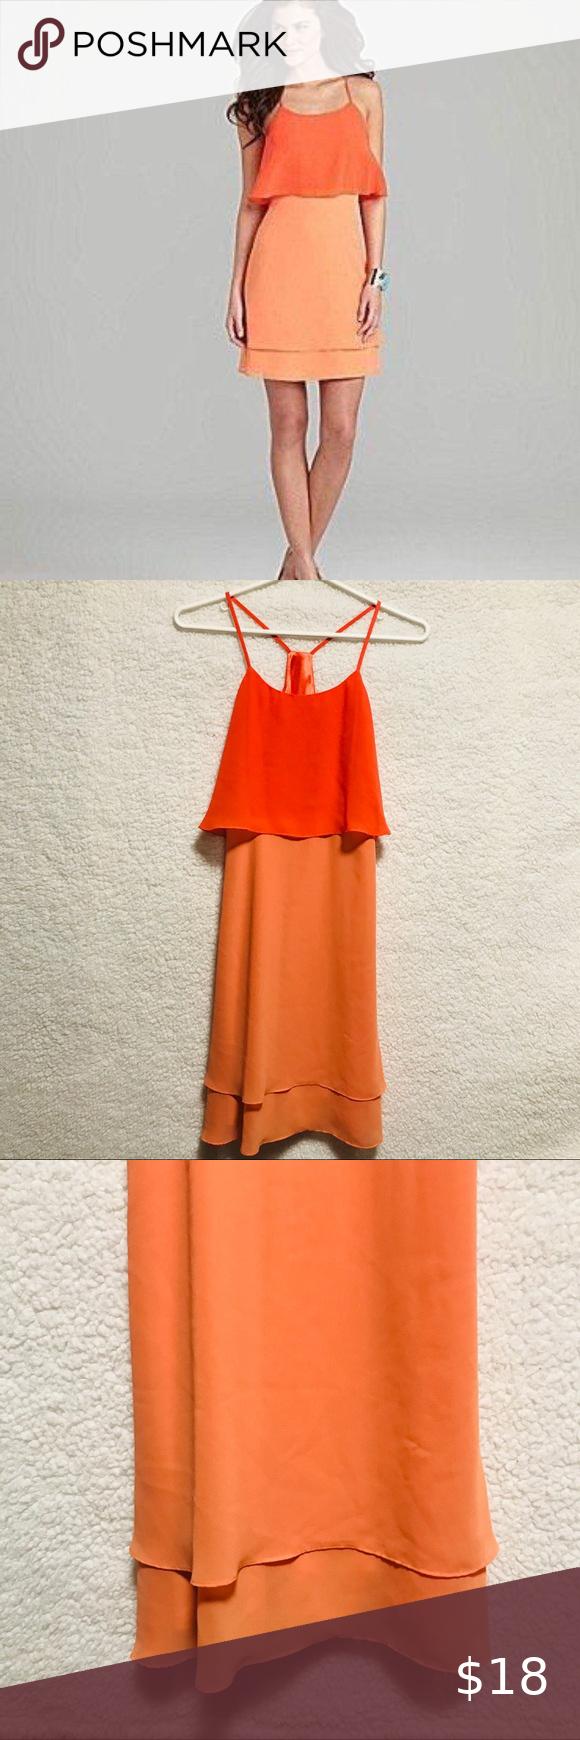 Gianni Bini Two Tone Orange Dress Gianni Bini Two Tone Color Orange Dress Racer Back Style With Spaghetti Straps Zips On T Orange Dress Dresses Perfect Dress [ 1740 x 580 Pixel ]